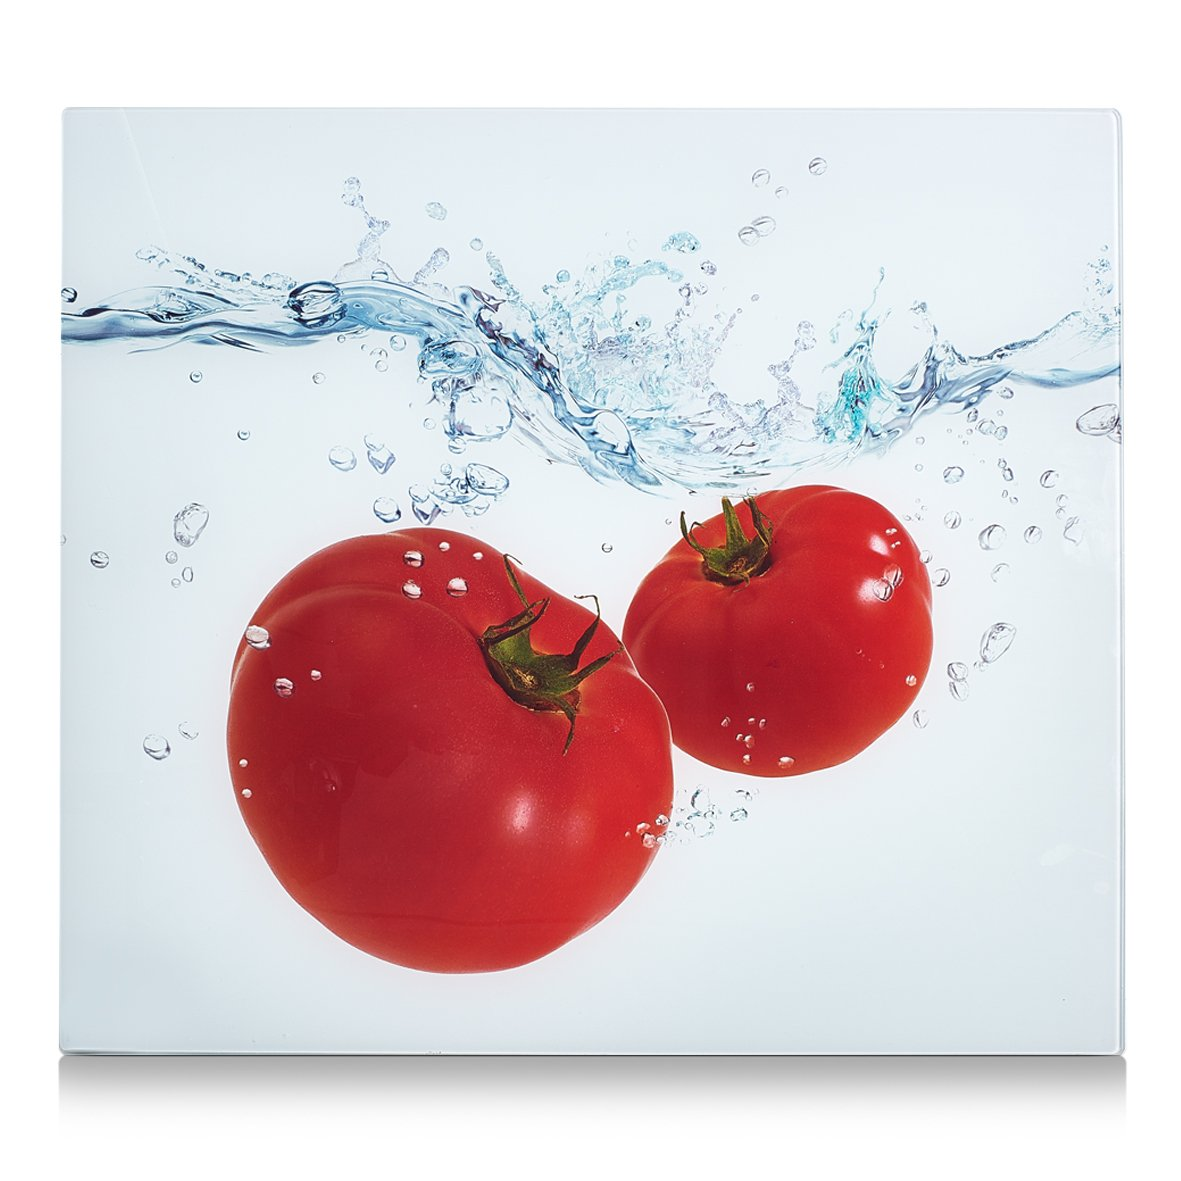 decorazione in vetro 56/x 50/x 2/cm Zeller 26307/cucina//abdeckplatte tomato Splash